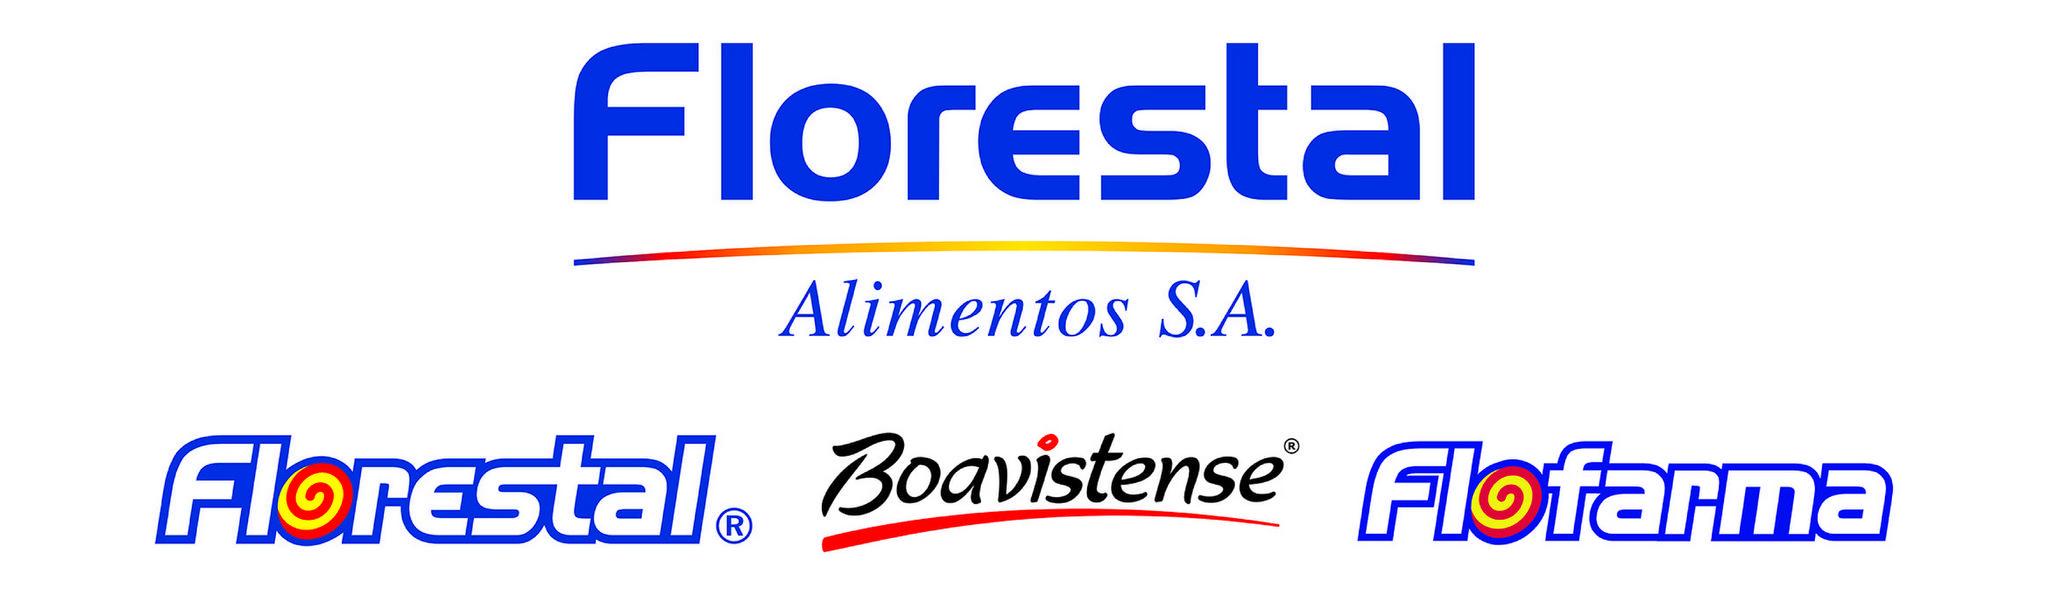 Florestal Alimentos SA